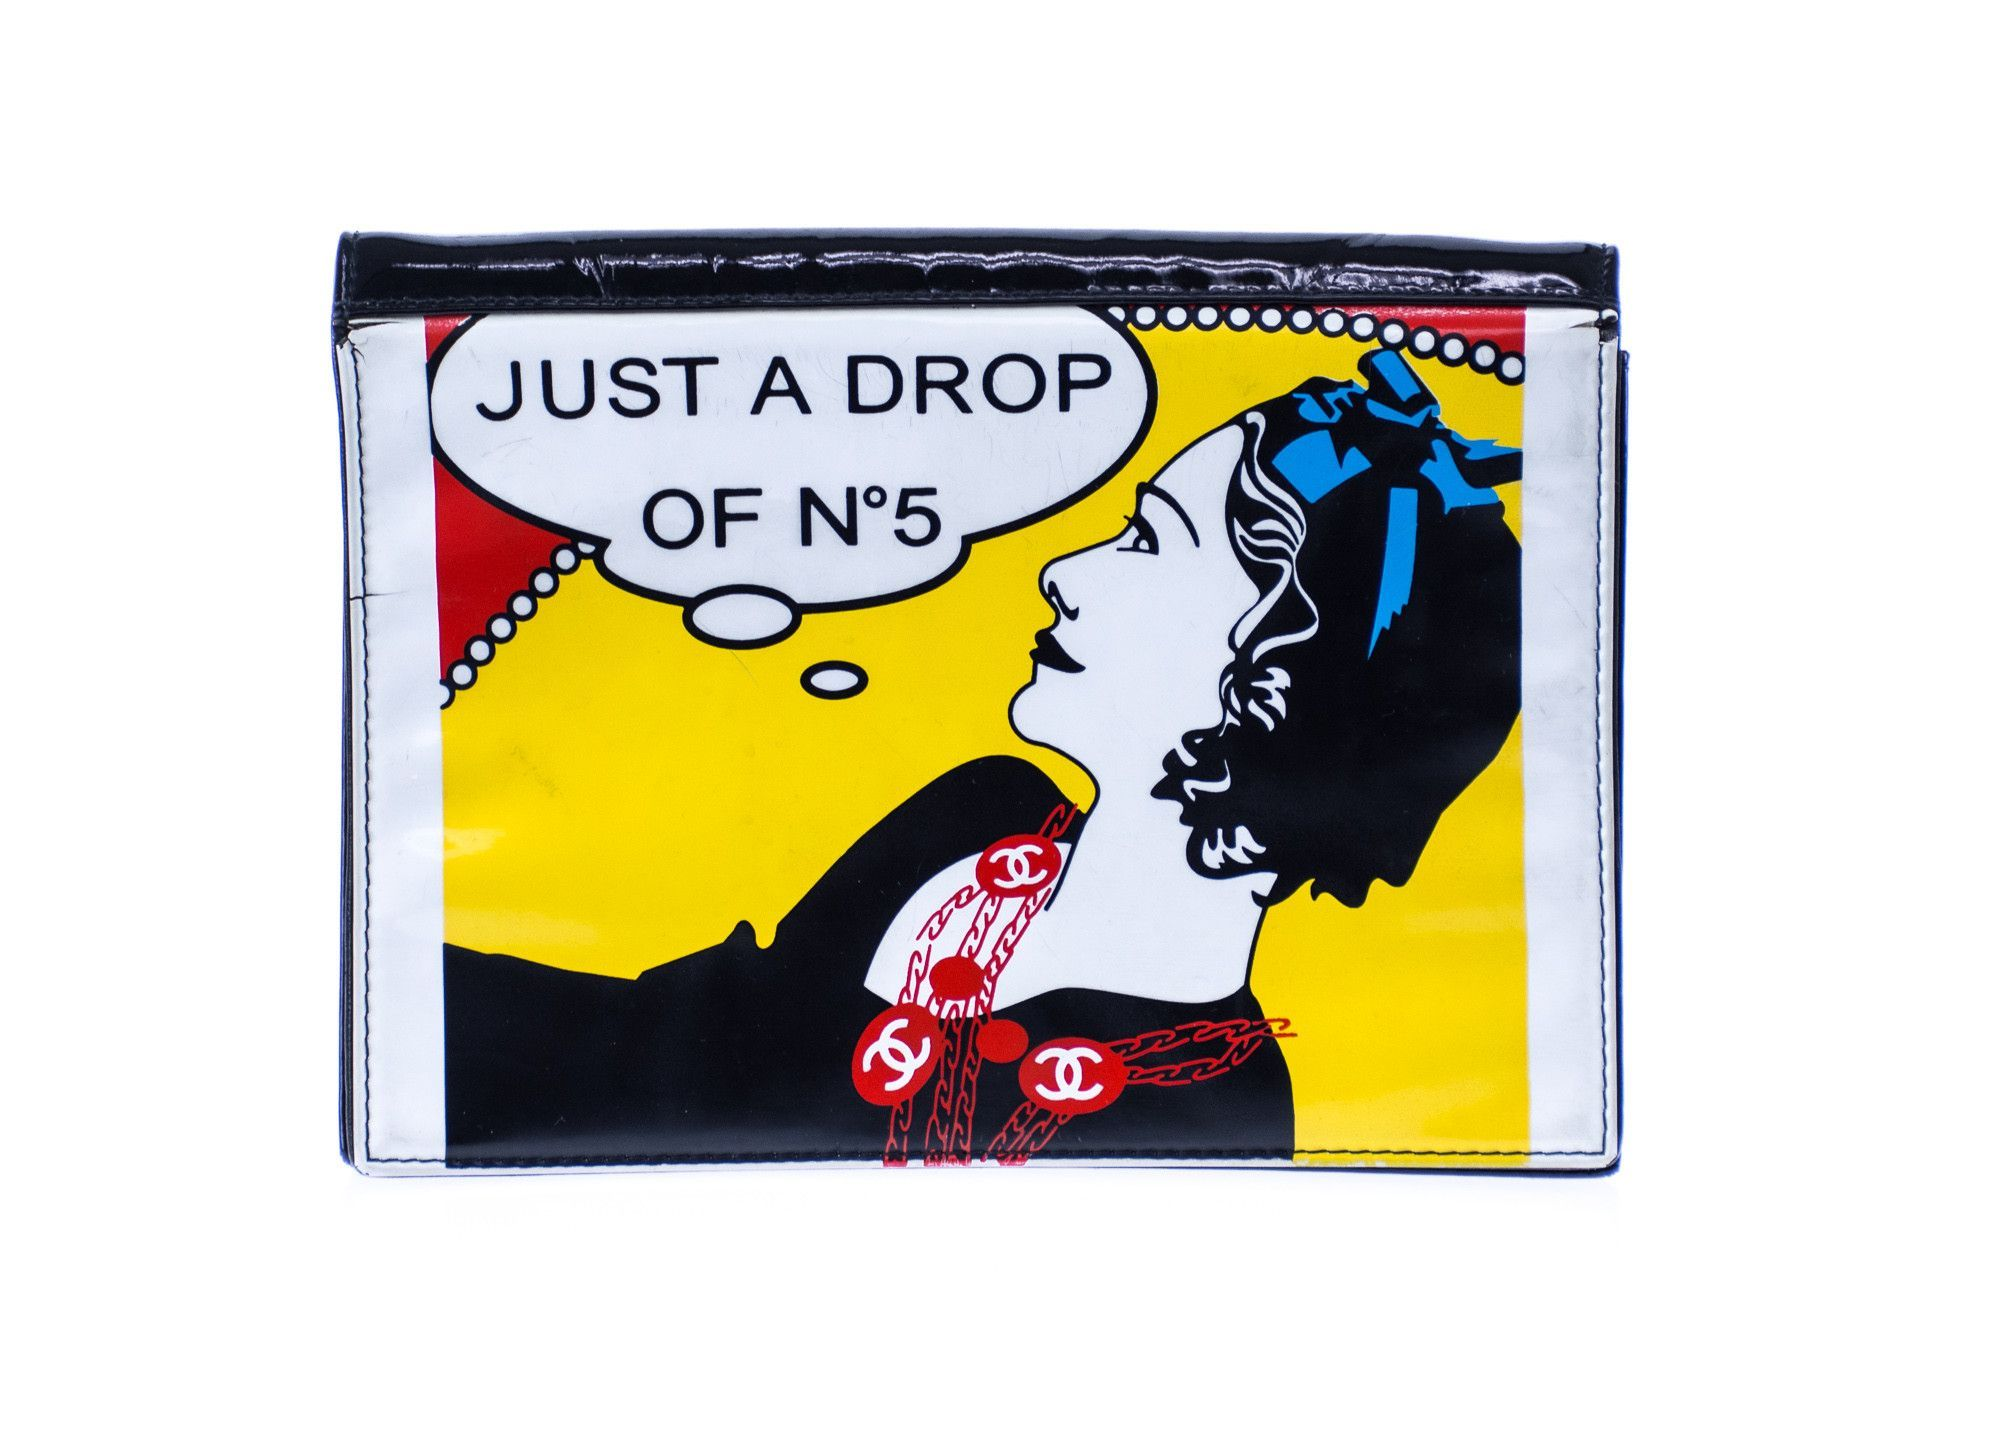 576e85f9b0f998 Chanel Just A Drop of No.5 Comic Clutch | Products | Pinterest ...